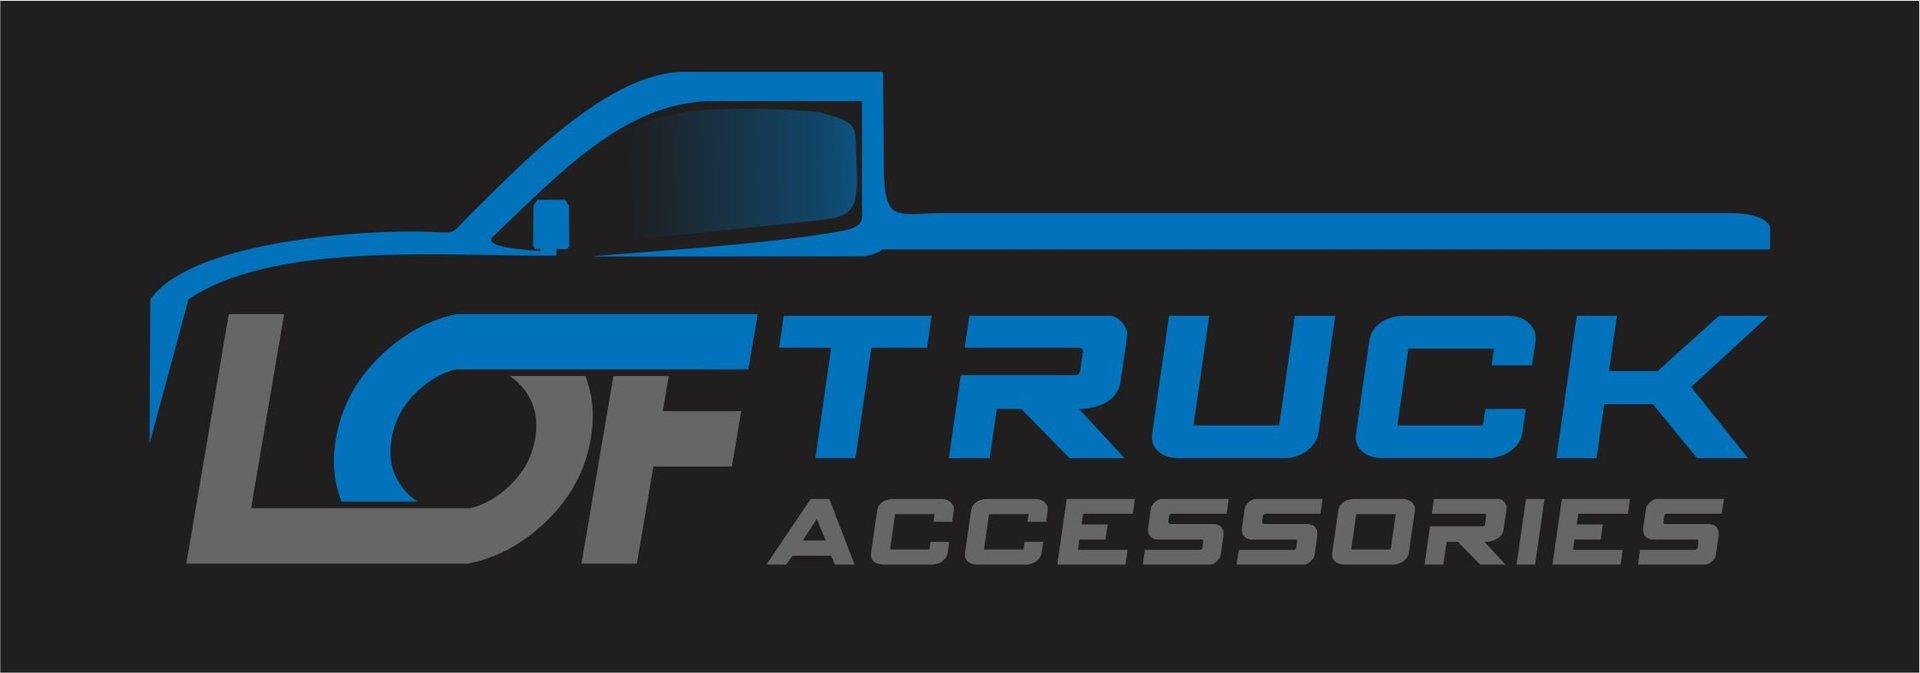 Lot O' Fun Truck Accessories - Logo